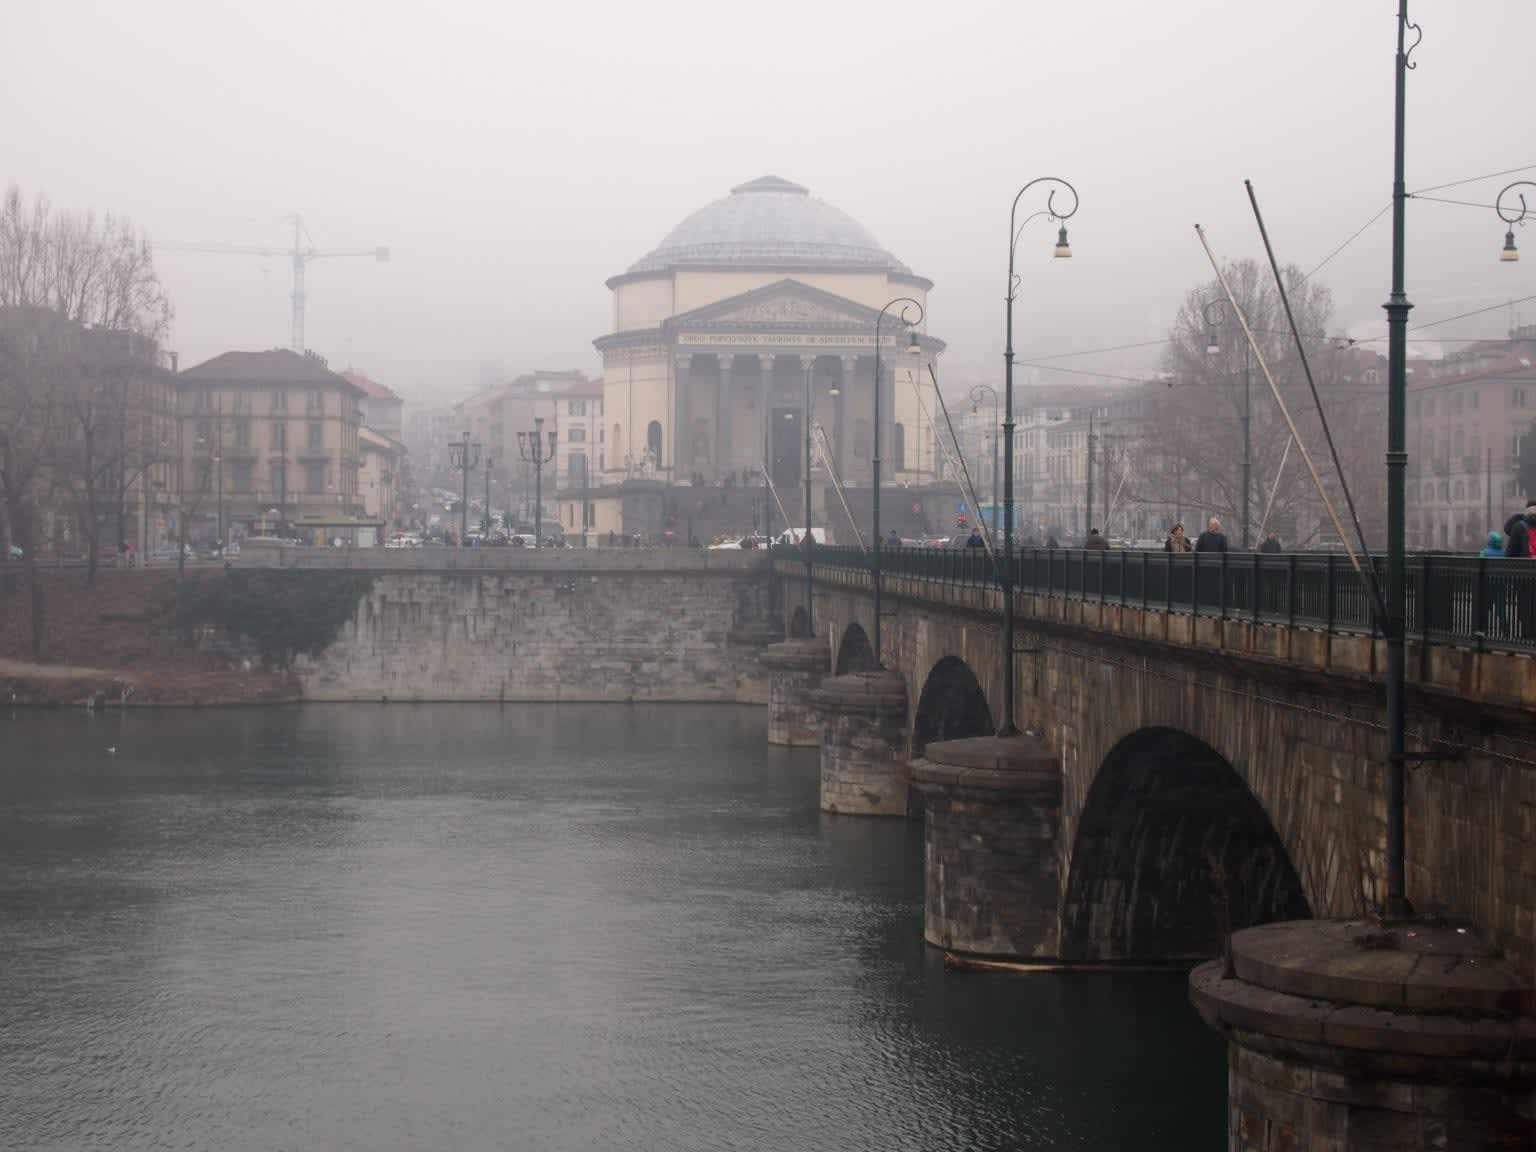 Guía para viajar a Turín (Torino)